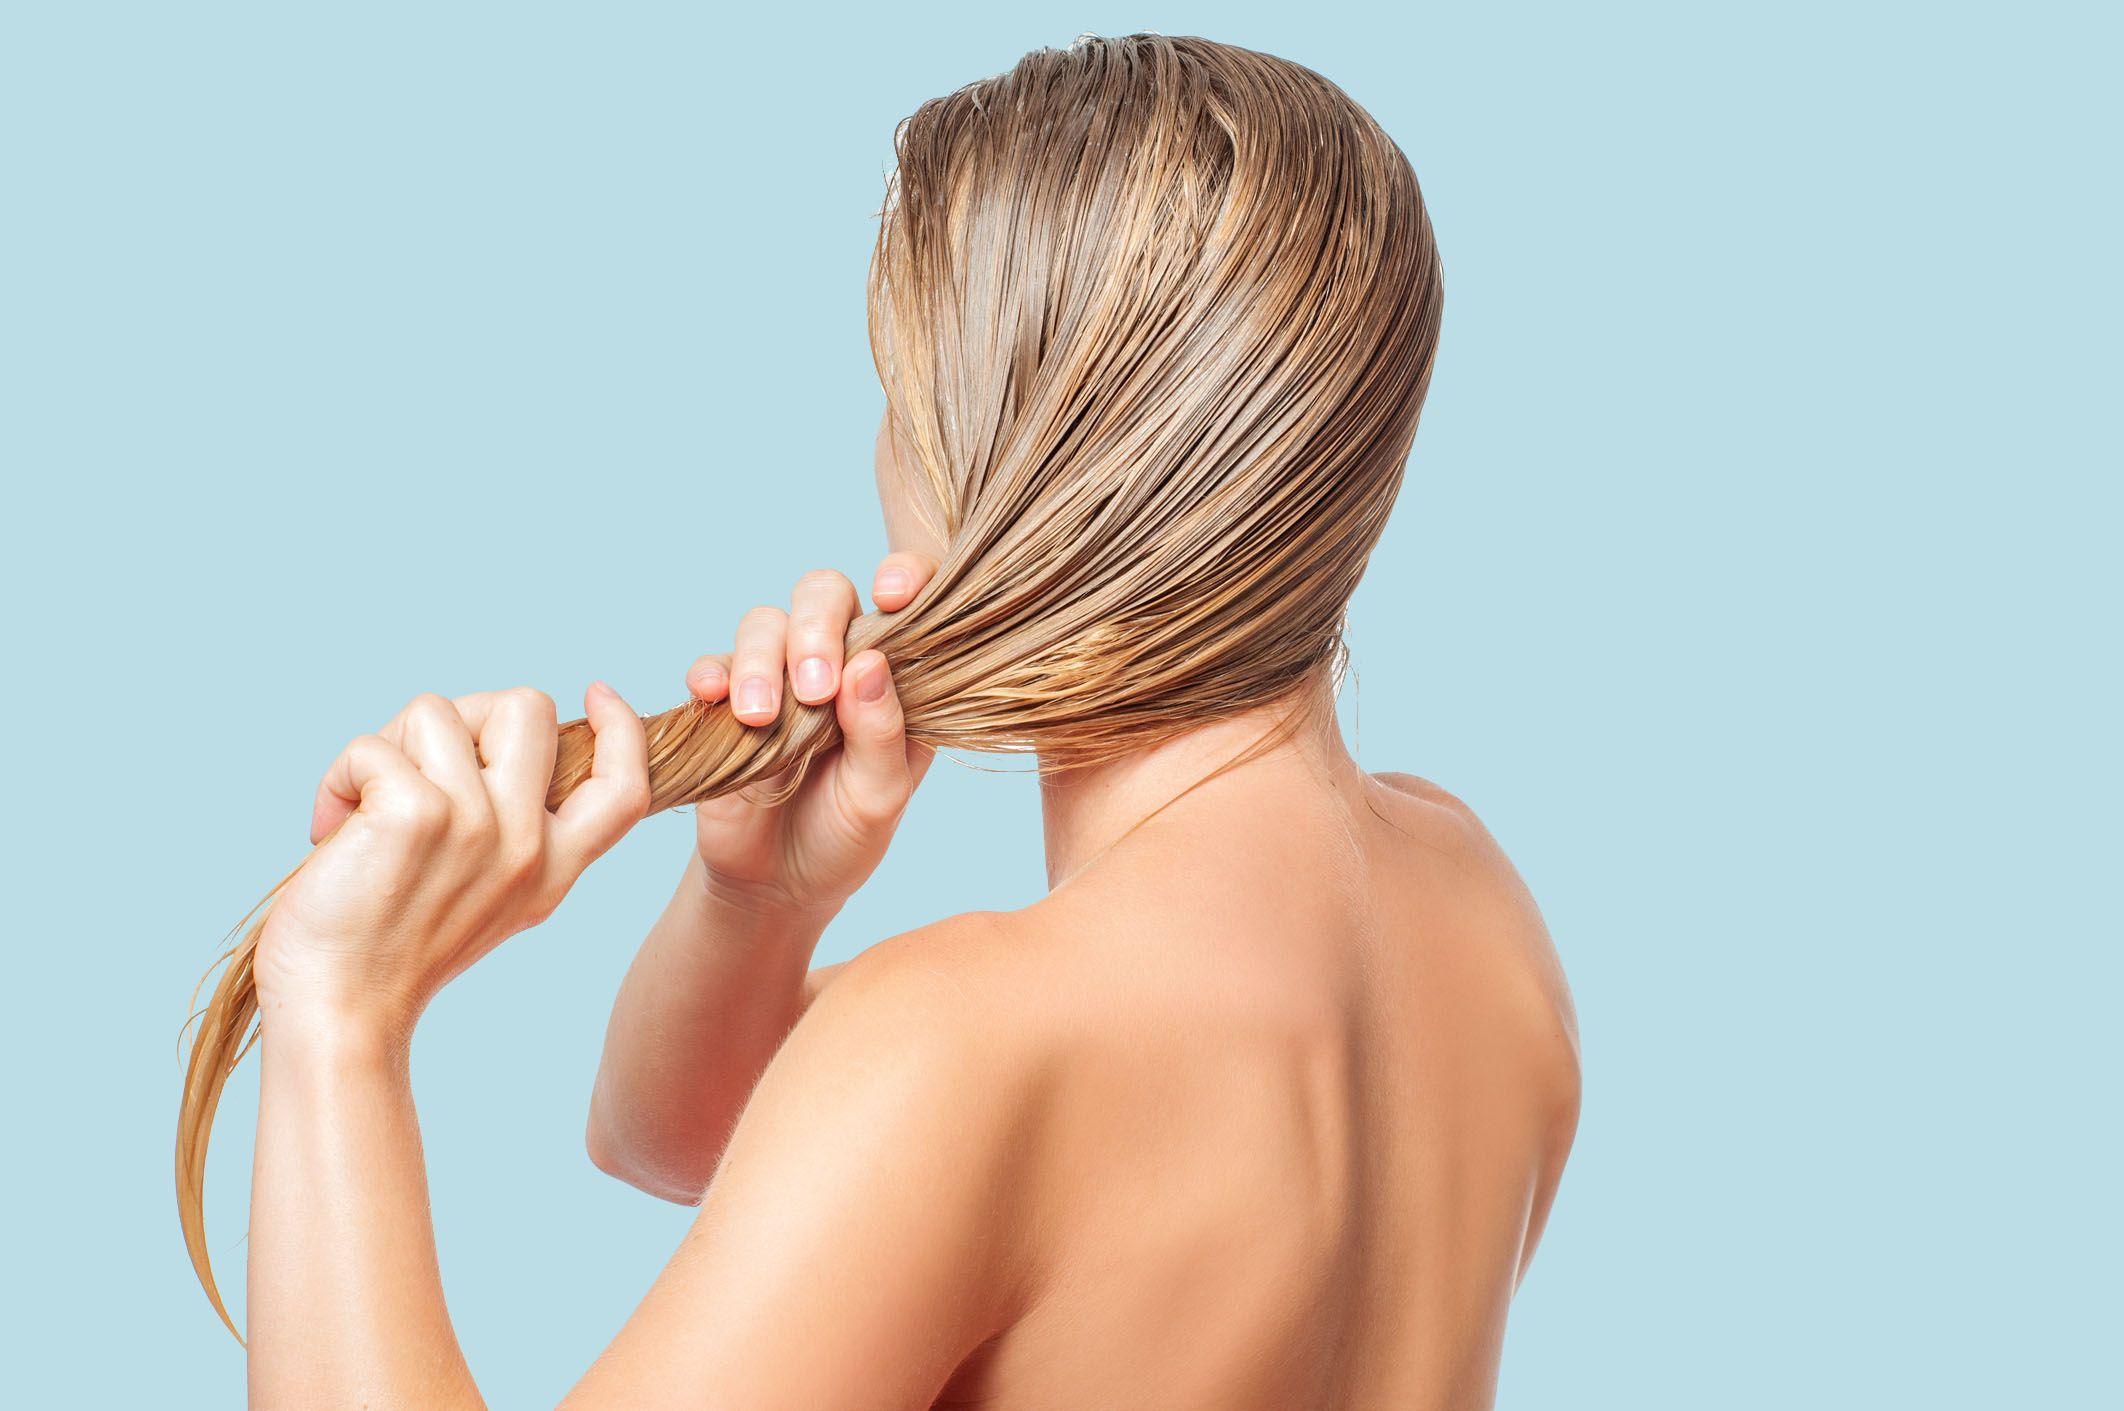 hair moisturizer products